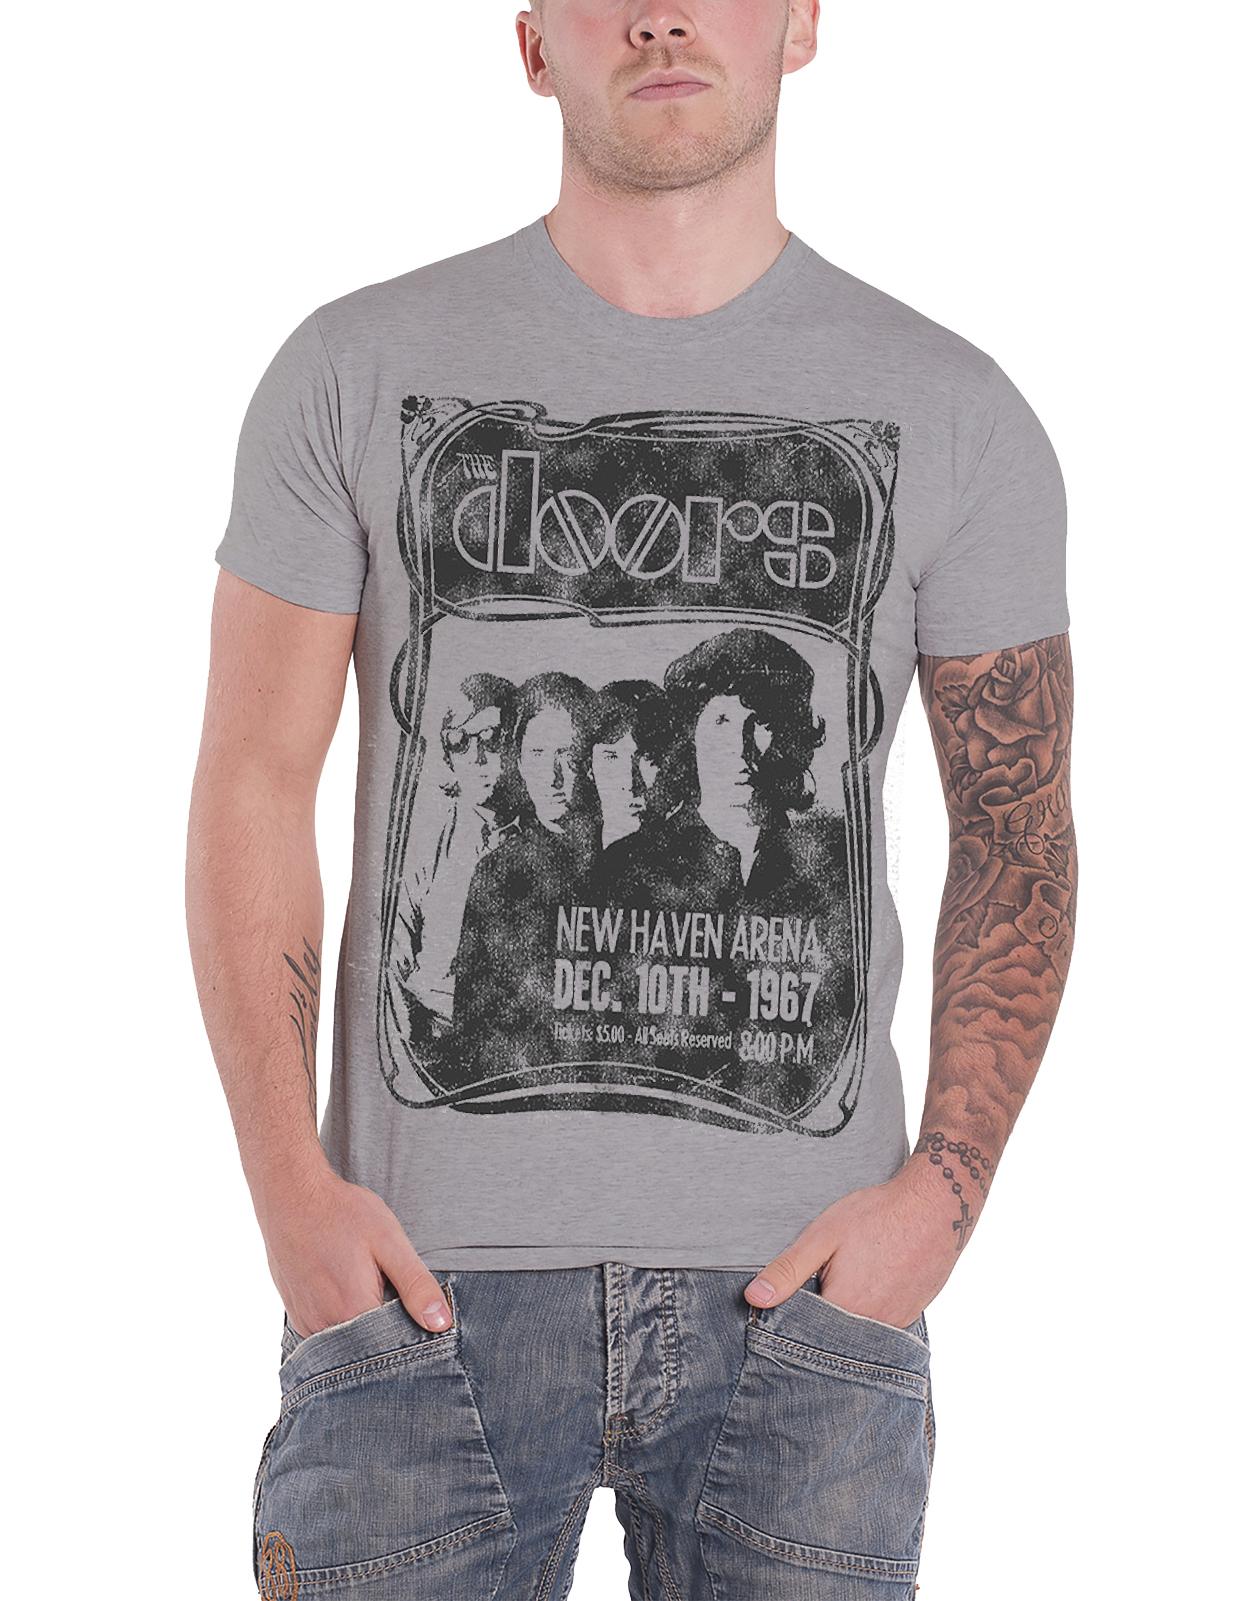 Officiel-The-Doors-T-Shirt-Jim-Morrison-poete-americain-Break-On-Through-Homme-NEUF miniature 42